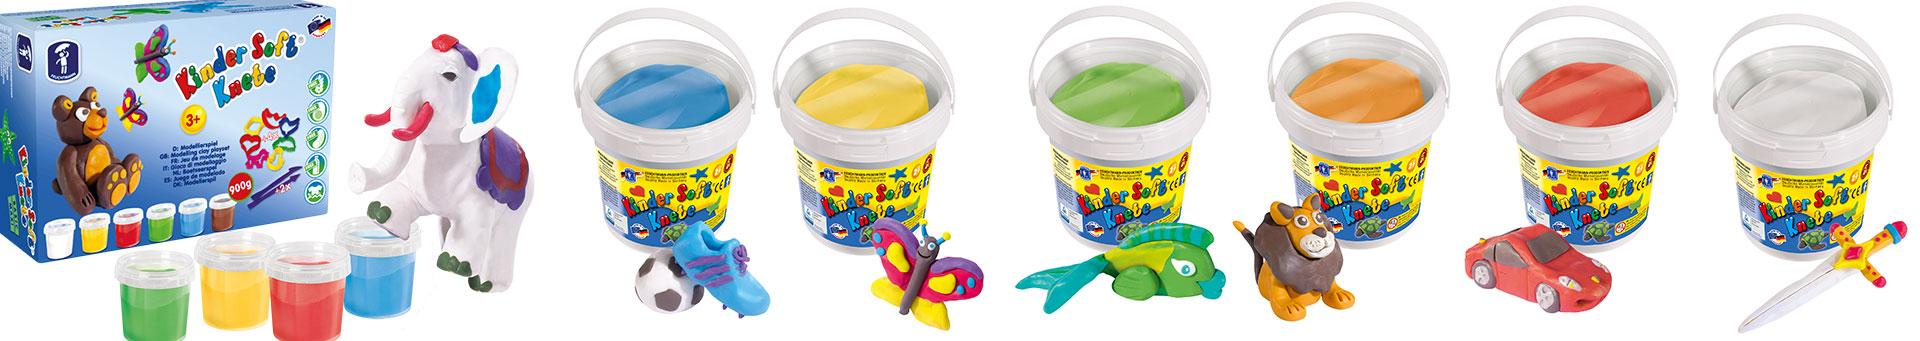 Feuchtmann Kinder Soft Knete Basic 150 g Dose FARBAUSWAHL Modellieren Knetmasse